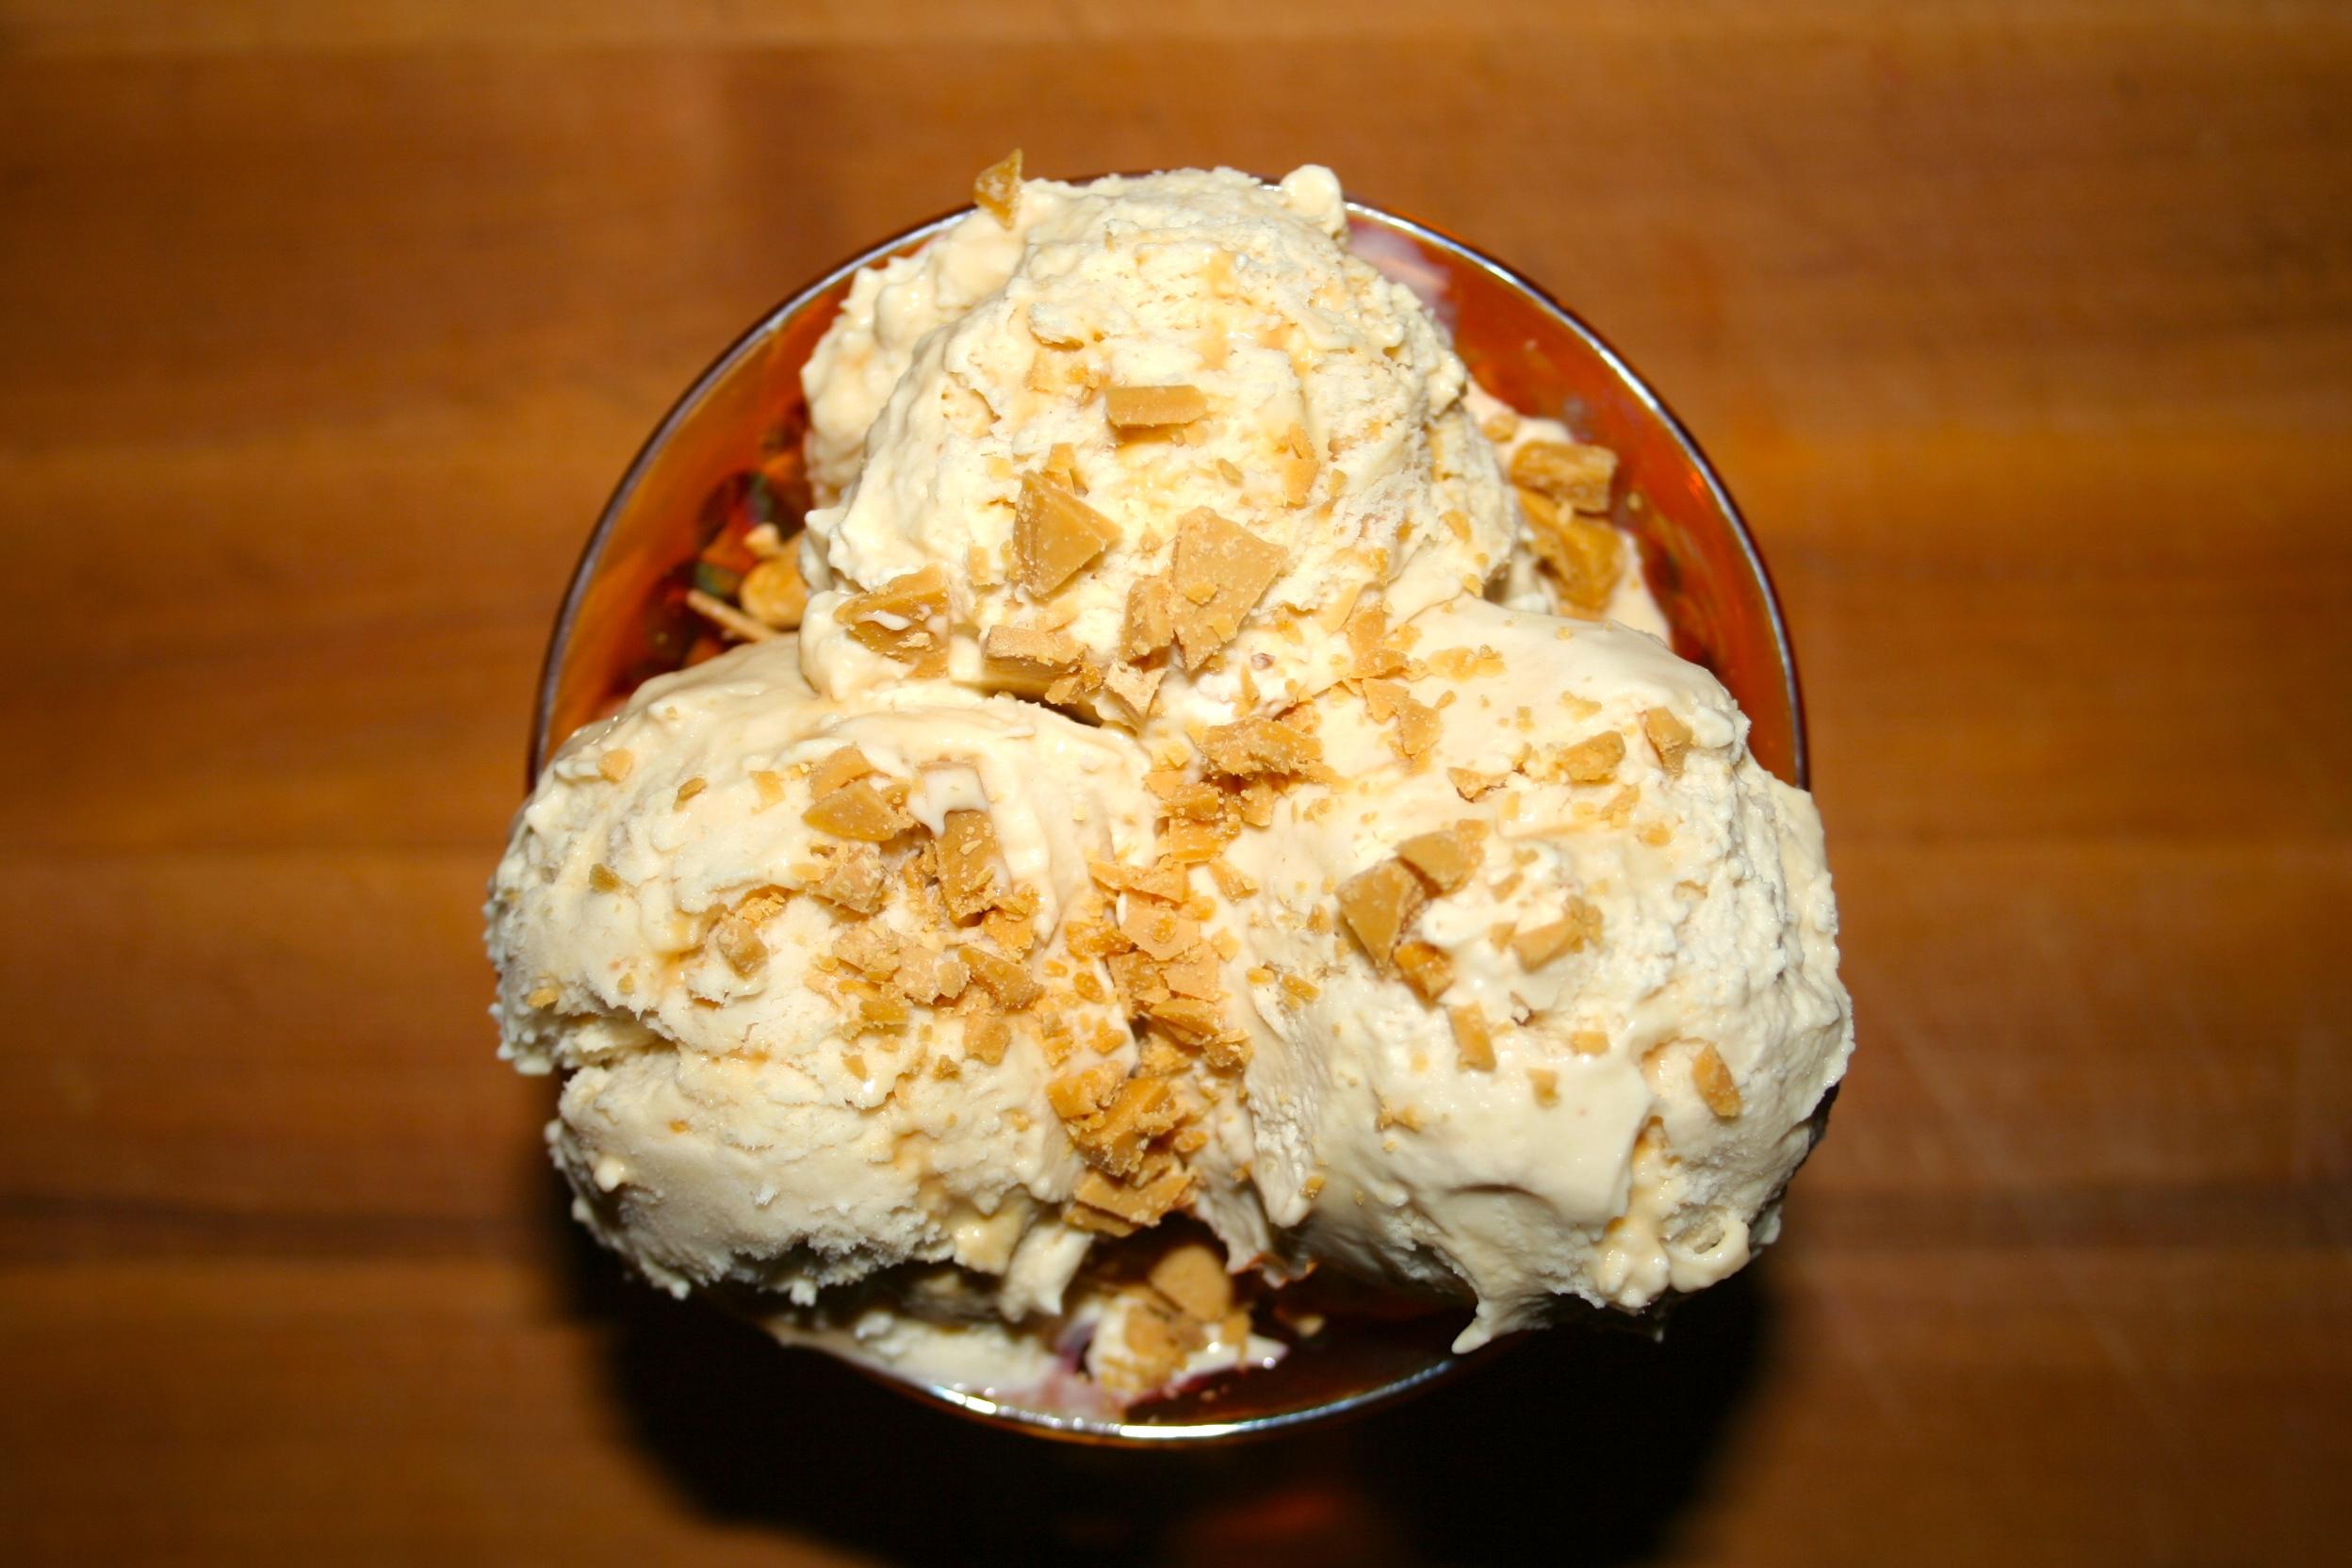 ... ice cream flavor of vanilla ice cream butter brickle ice cream butter